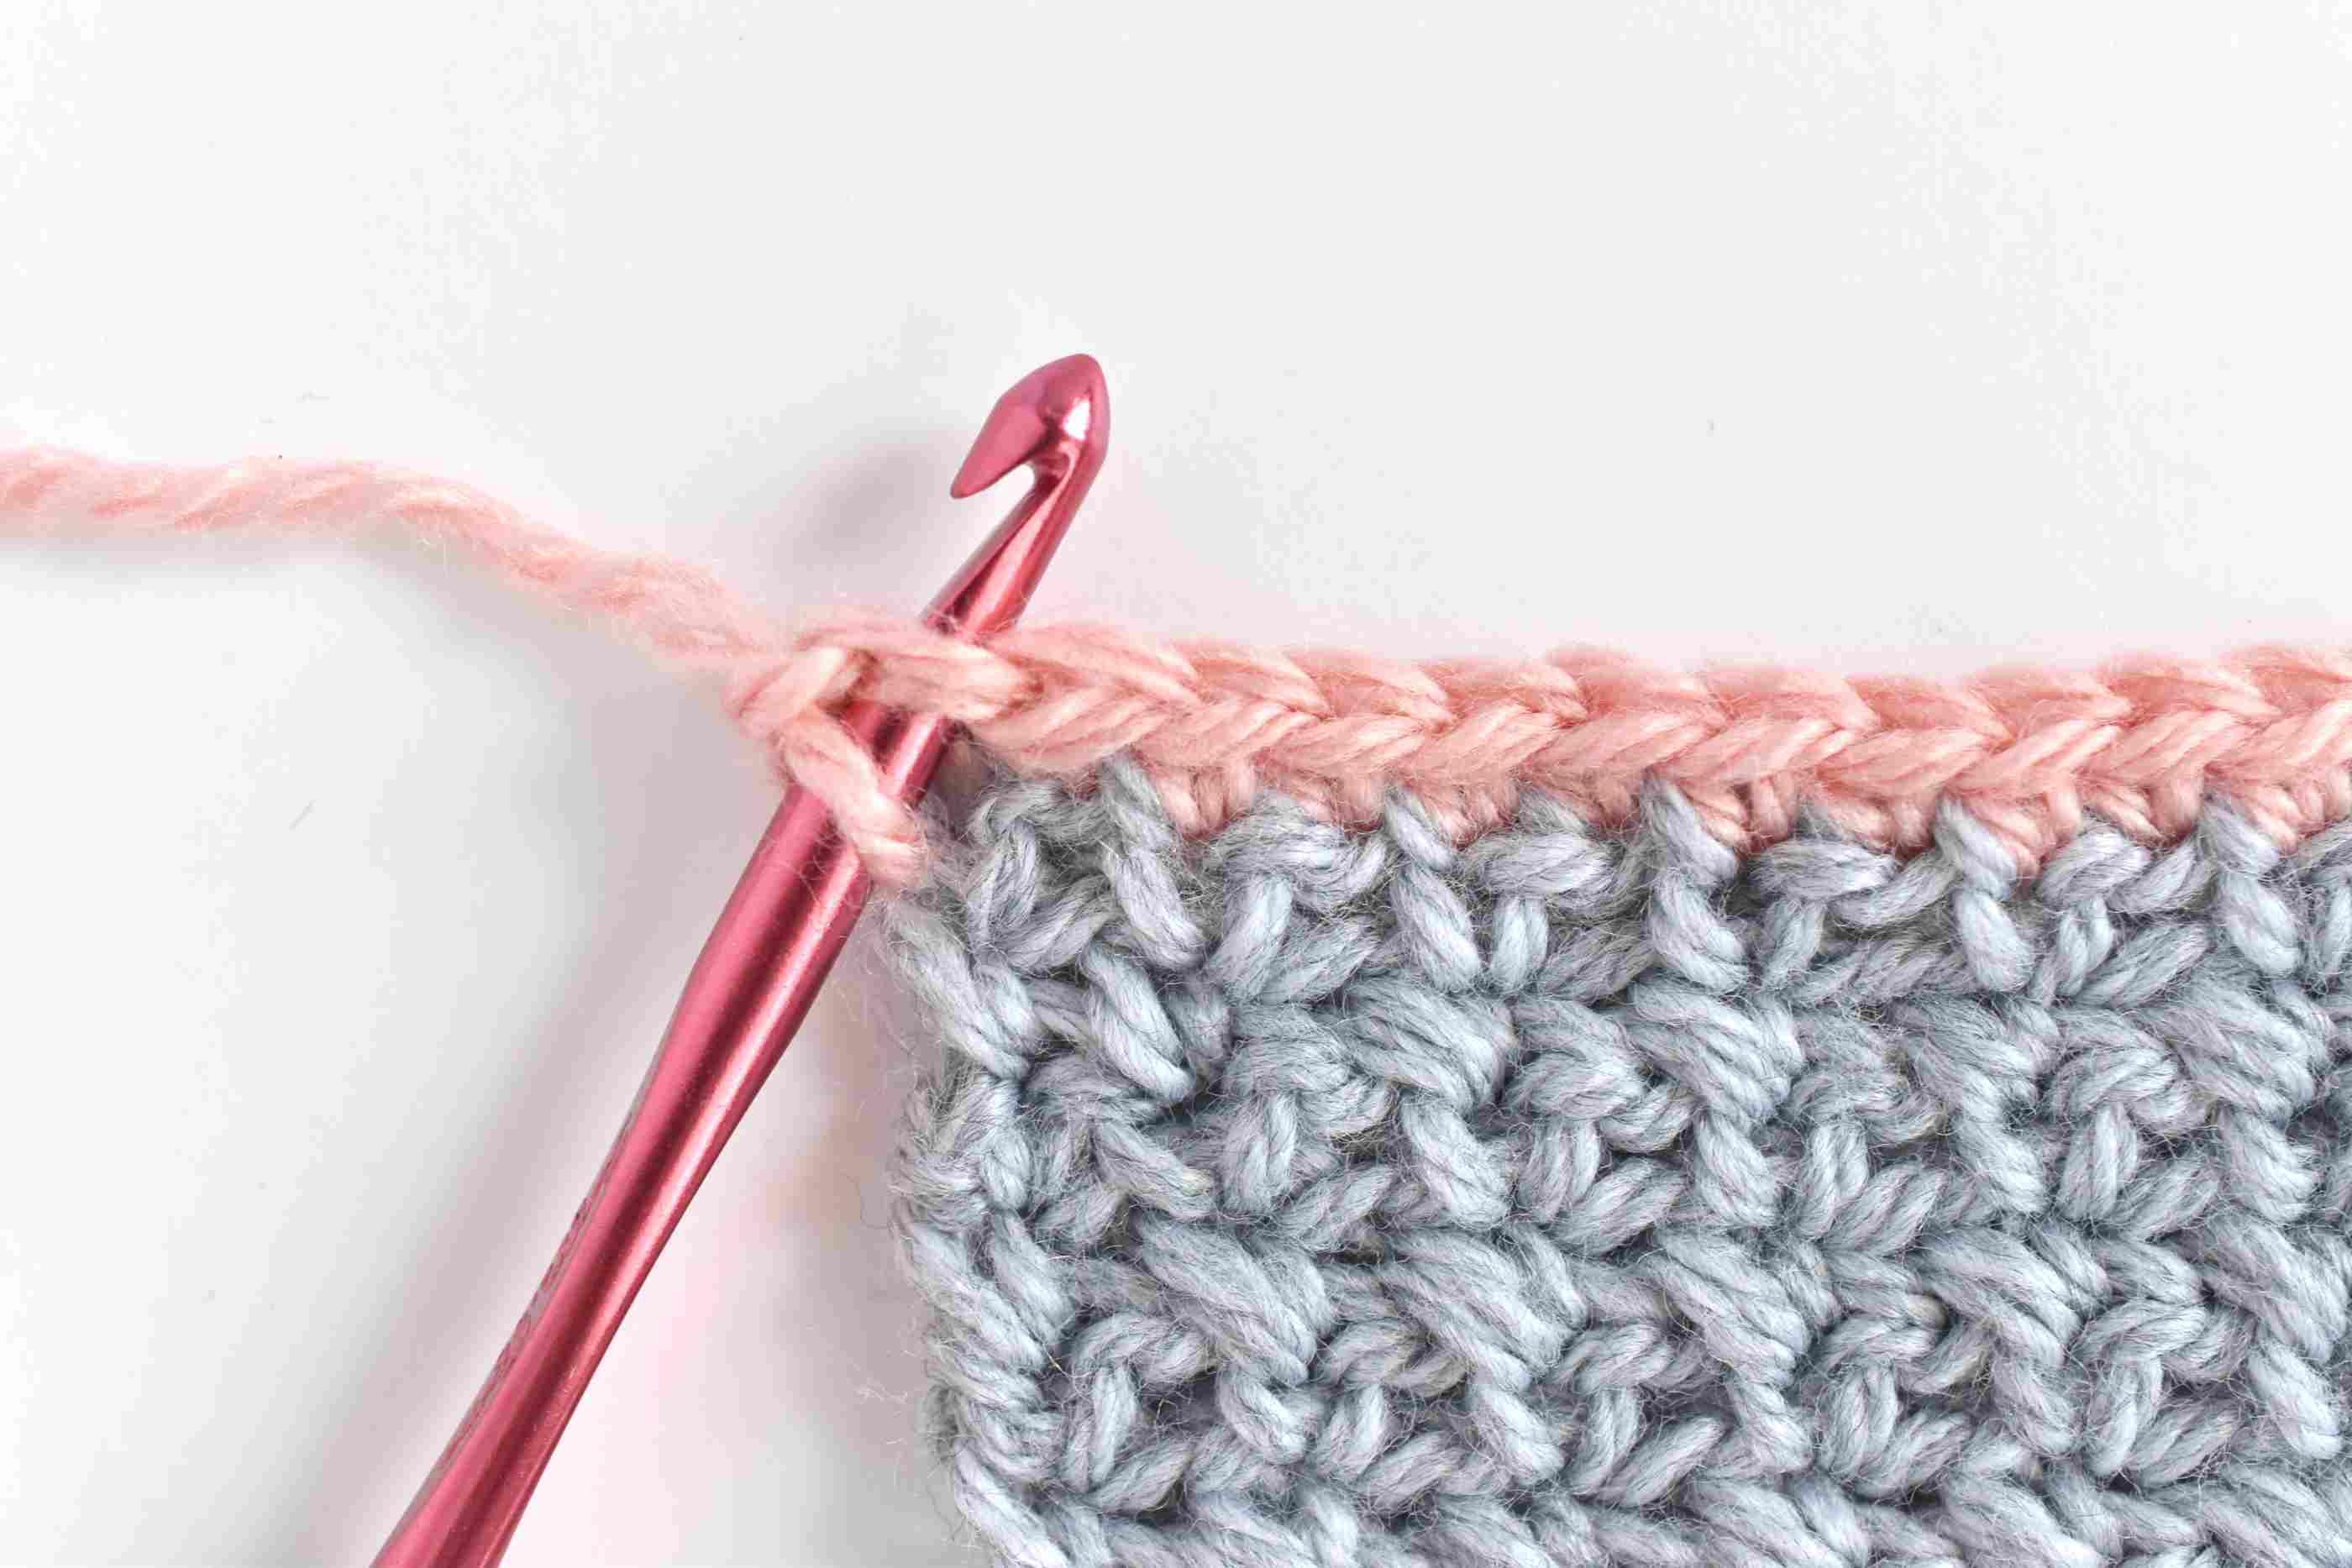 A crochet hook crab stitching